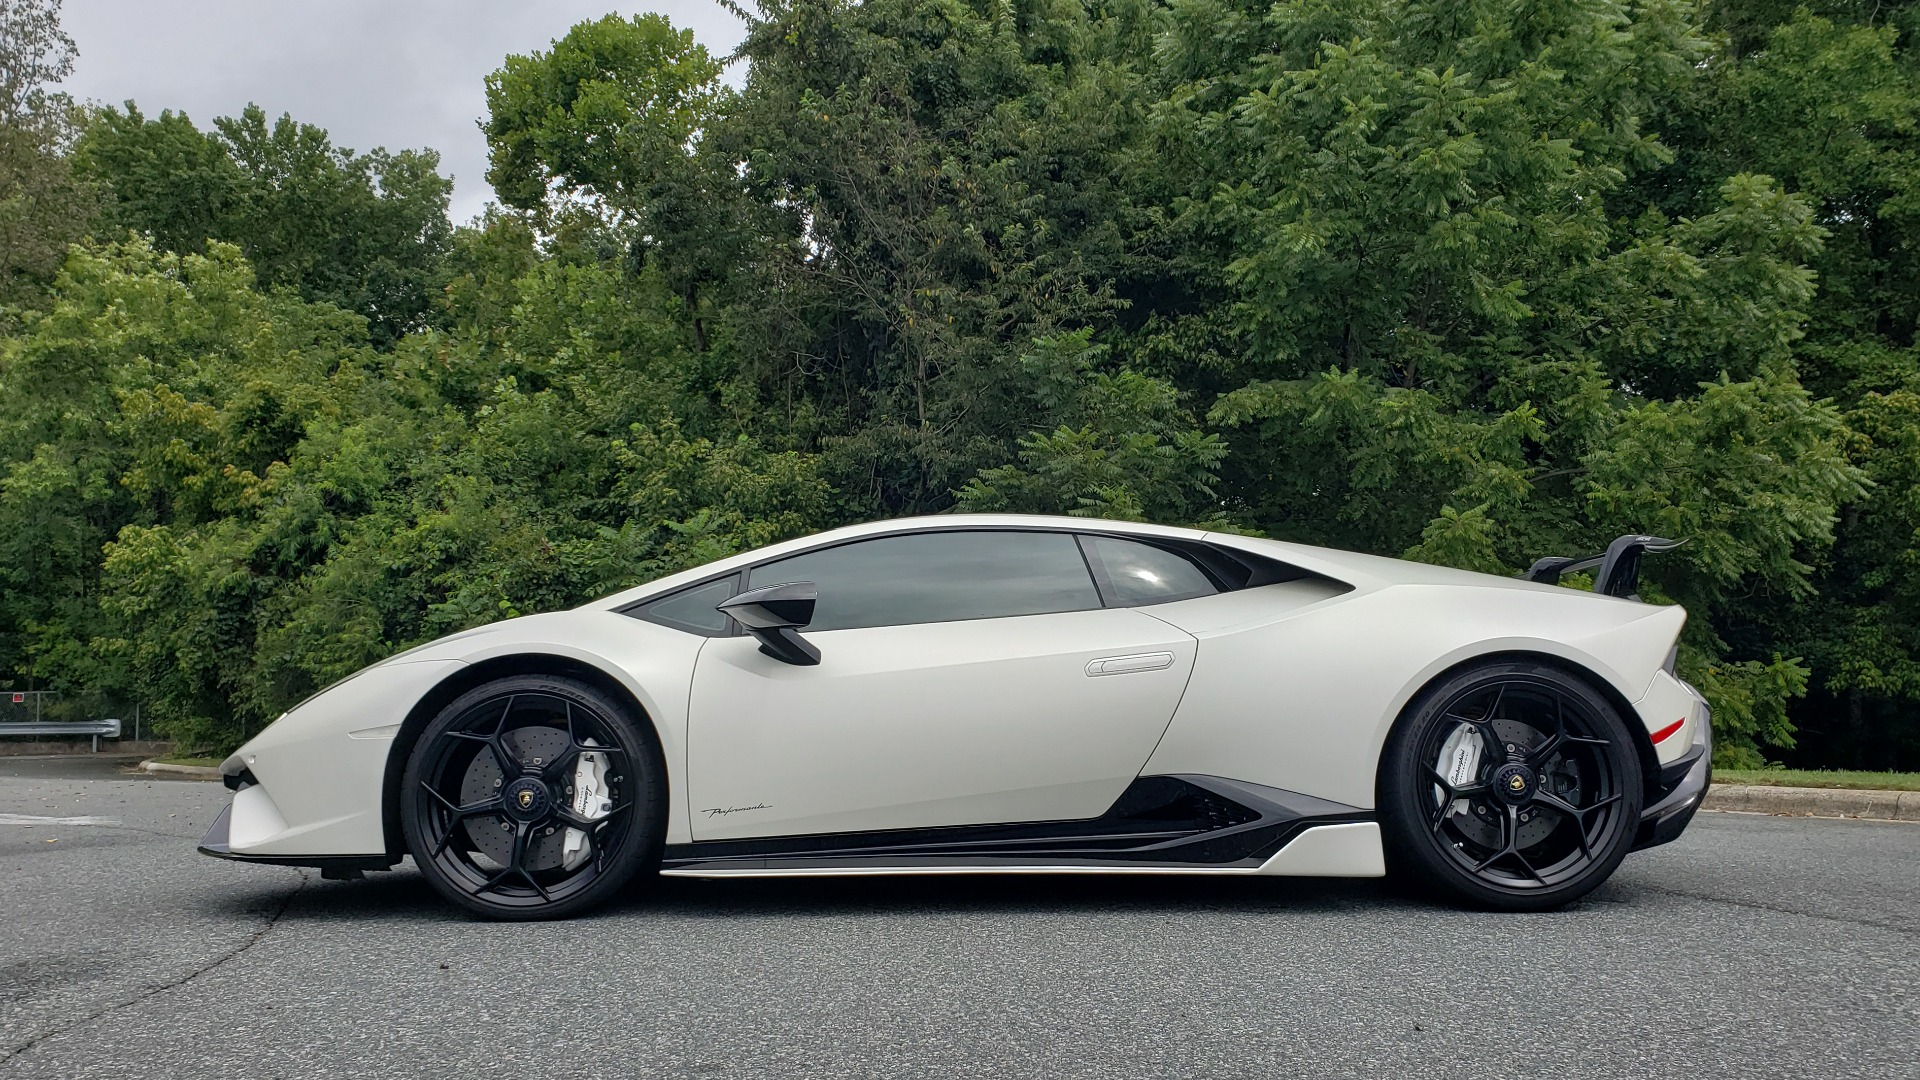 Used 2018 Lamborghini HURACAN PERFORMANTE 5.2L V10 / 630HP / 7-SPD AUTO / AWD / NAV / PREM SND for sale $269,995 at Formula Imports in Charlotte NC 28227 4